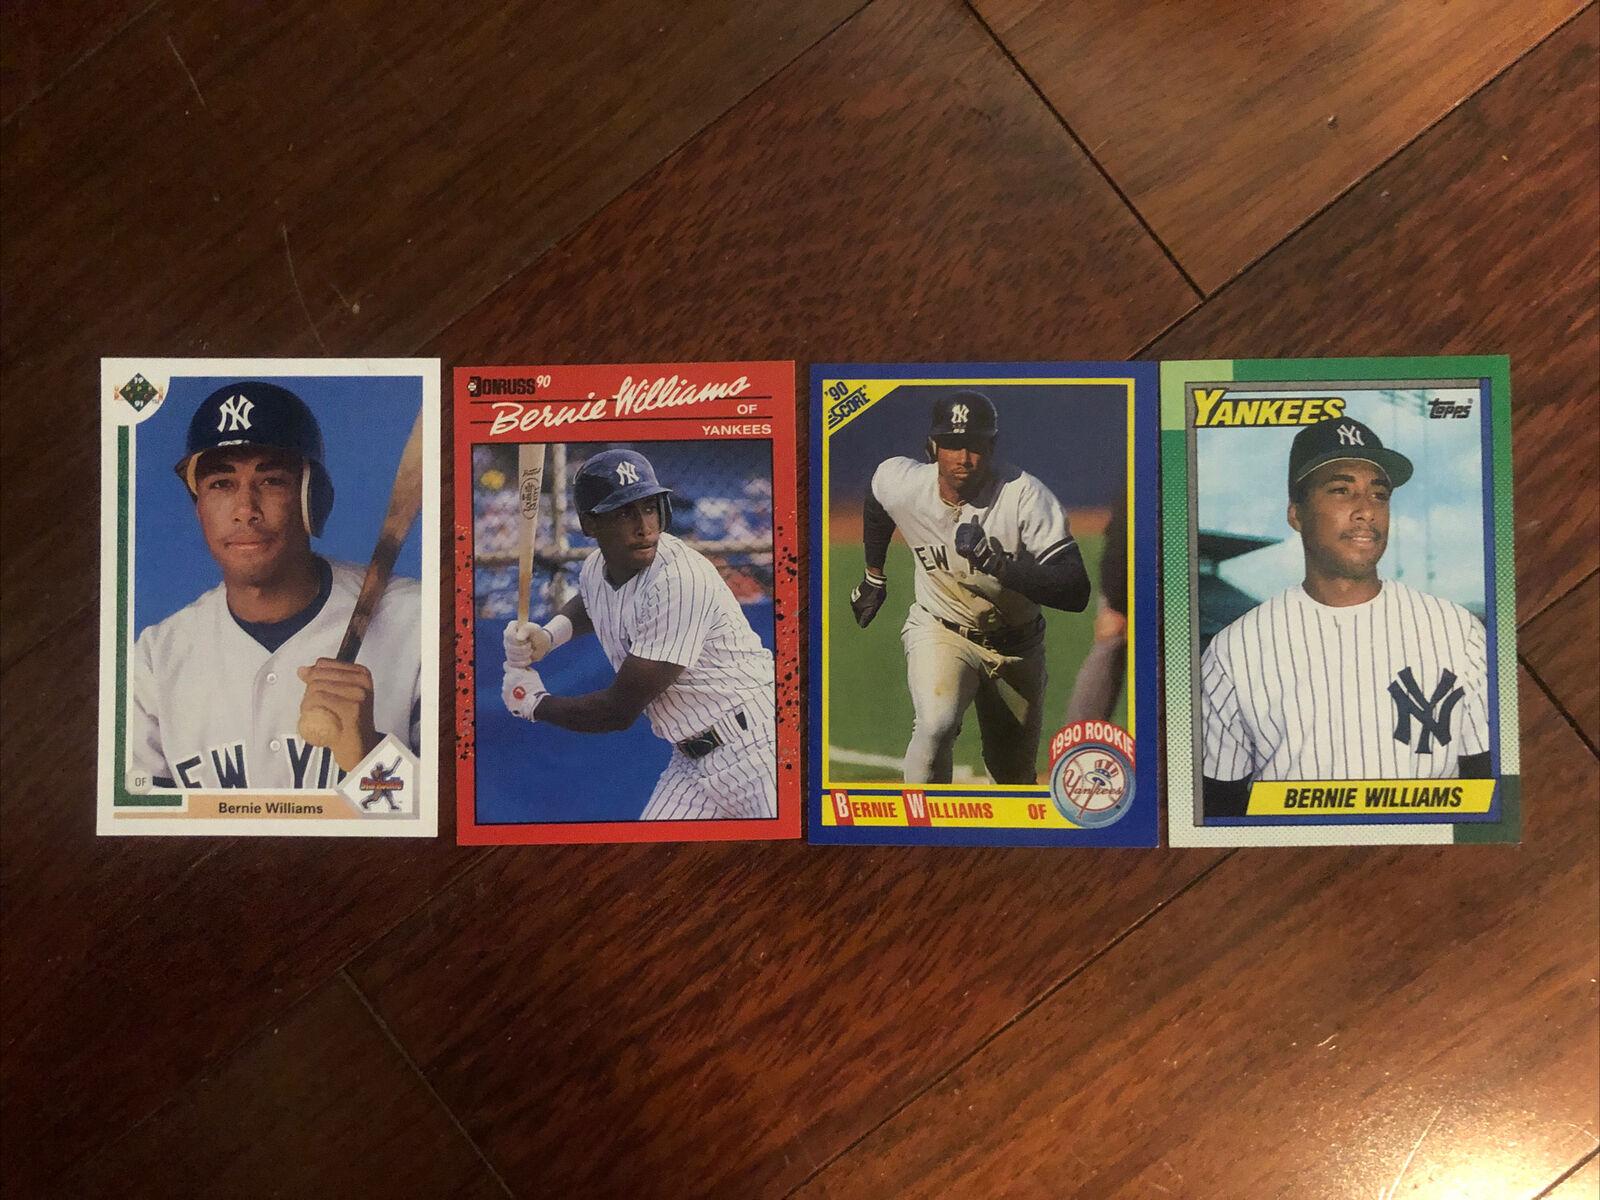 1990 Topps Baseball #701 Bernie Williams Rookie Card